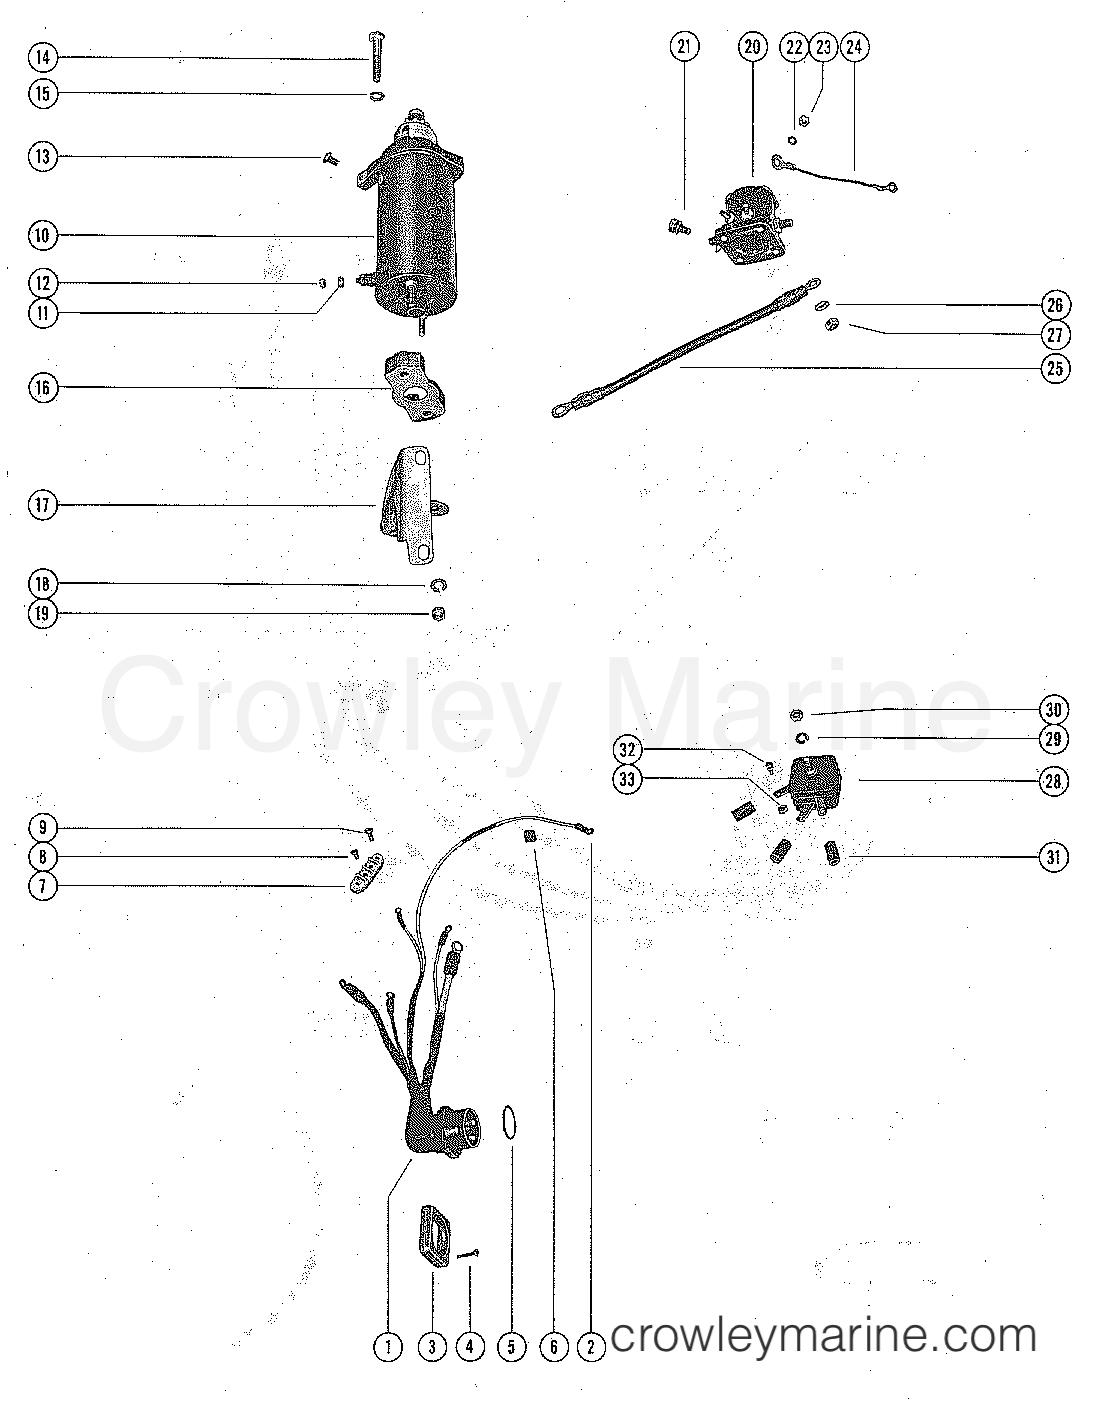 Serial Wiring Diagram